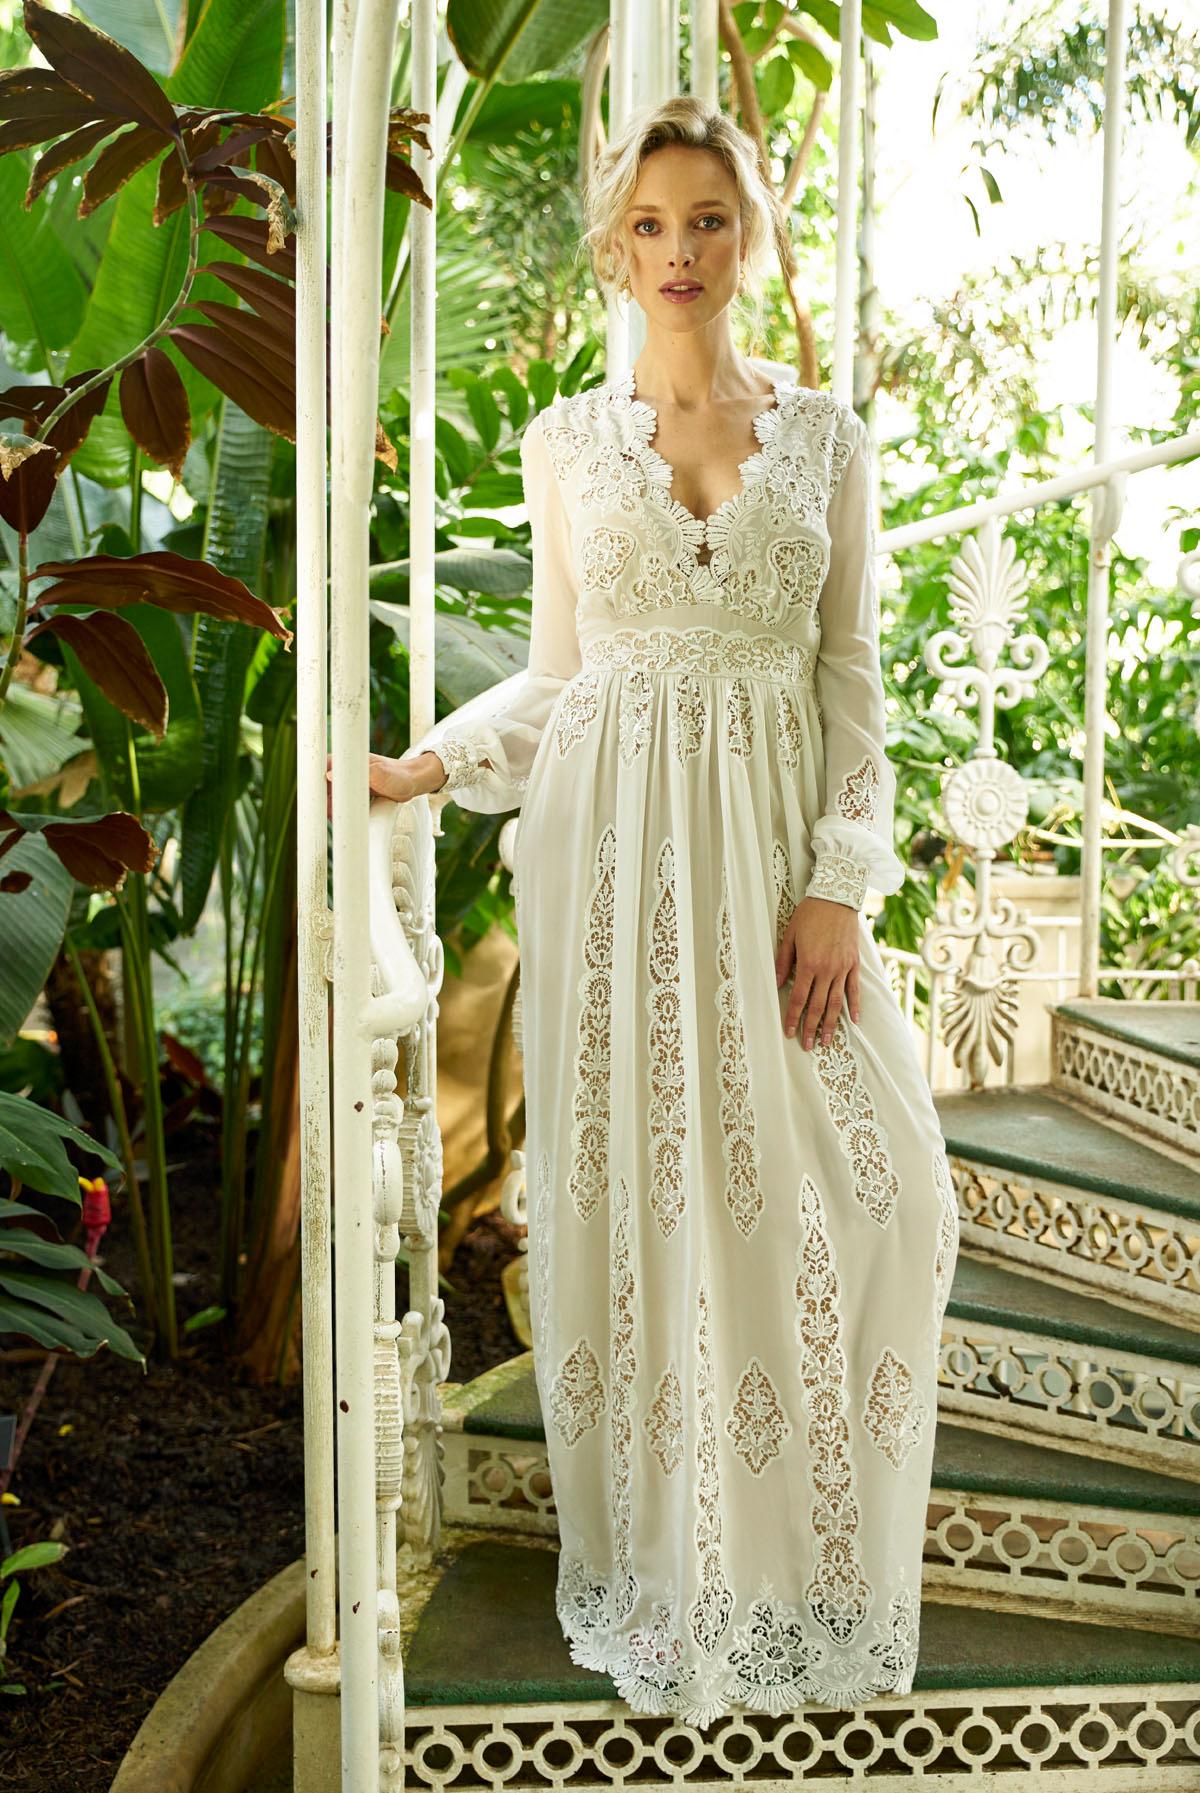 Introducing Francis Bridal – Contemporary Bohemian Wedding Dresses